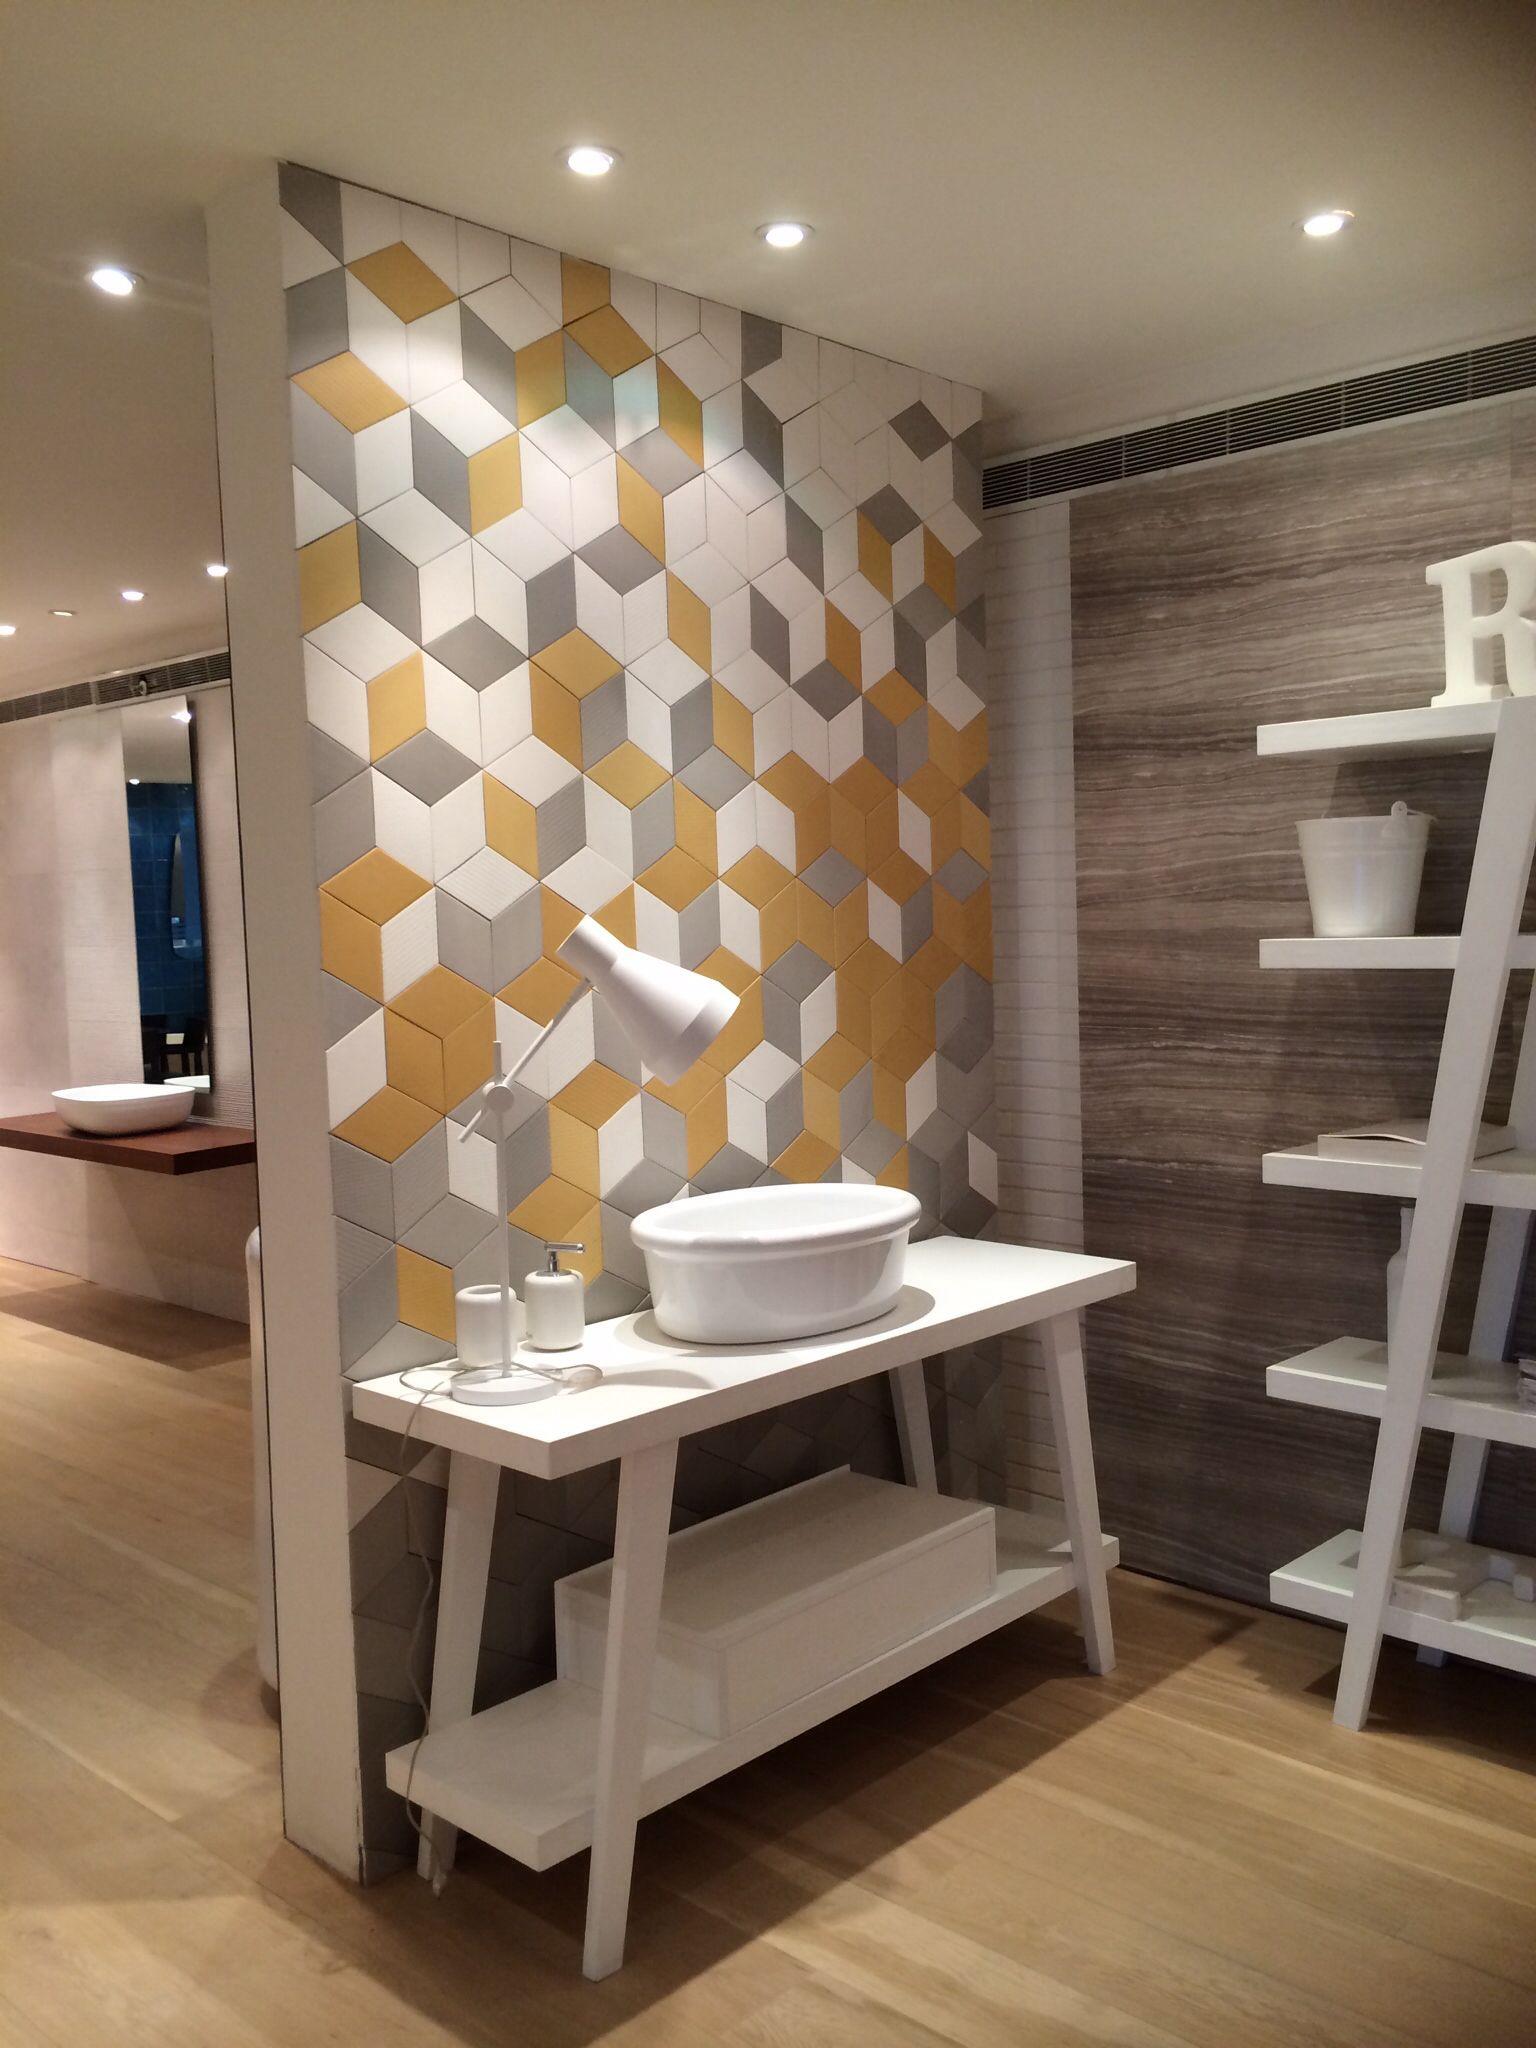 Mutina tex raw edges yellow, gray and white. - toilet ideetjes ...